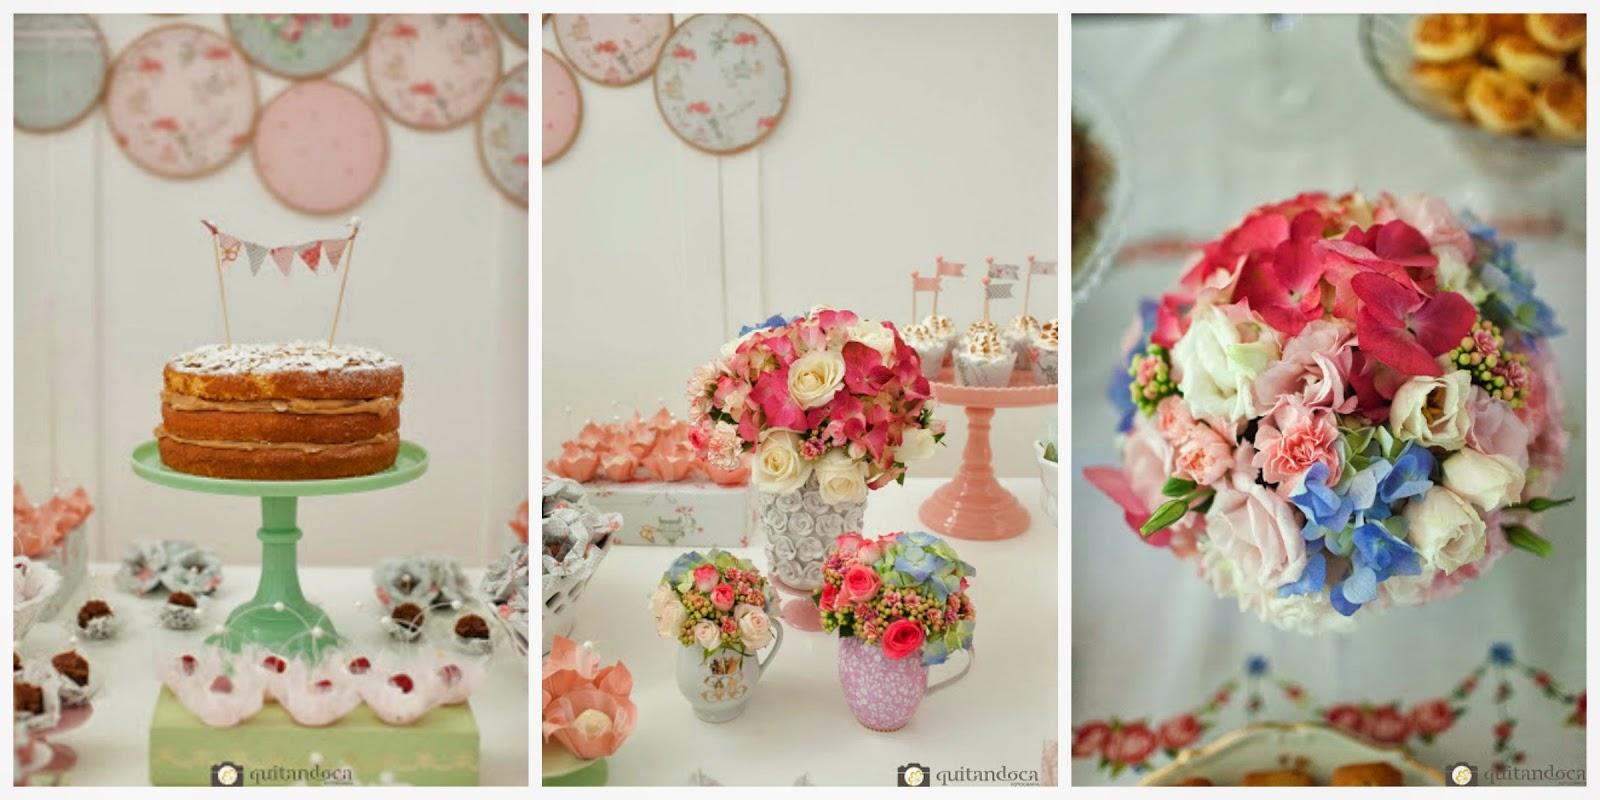 inspiracao-shabby-chic-romantica-delicada-candy-colors-flores